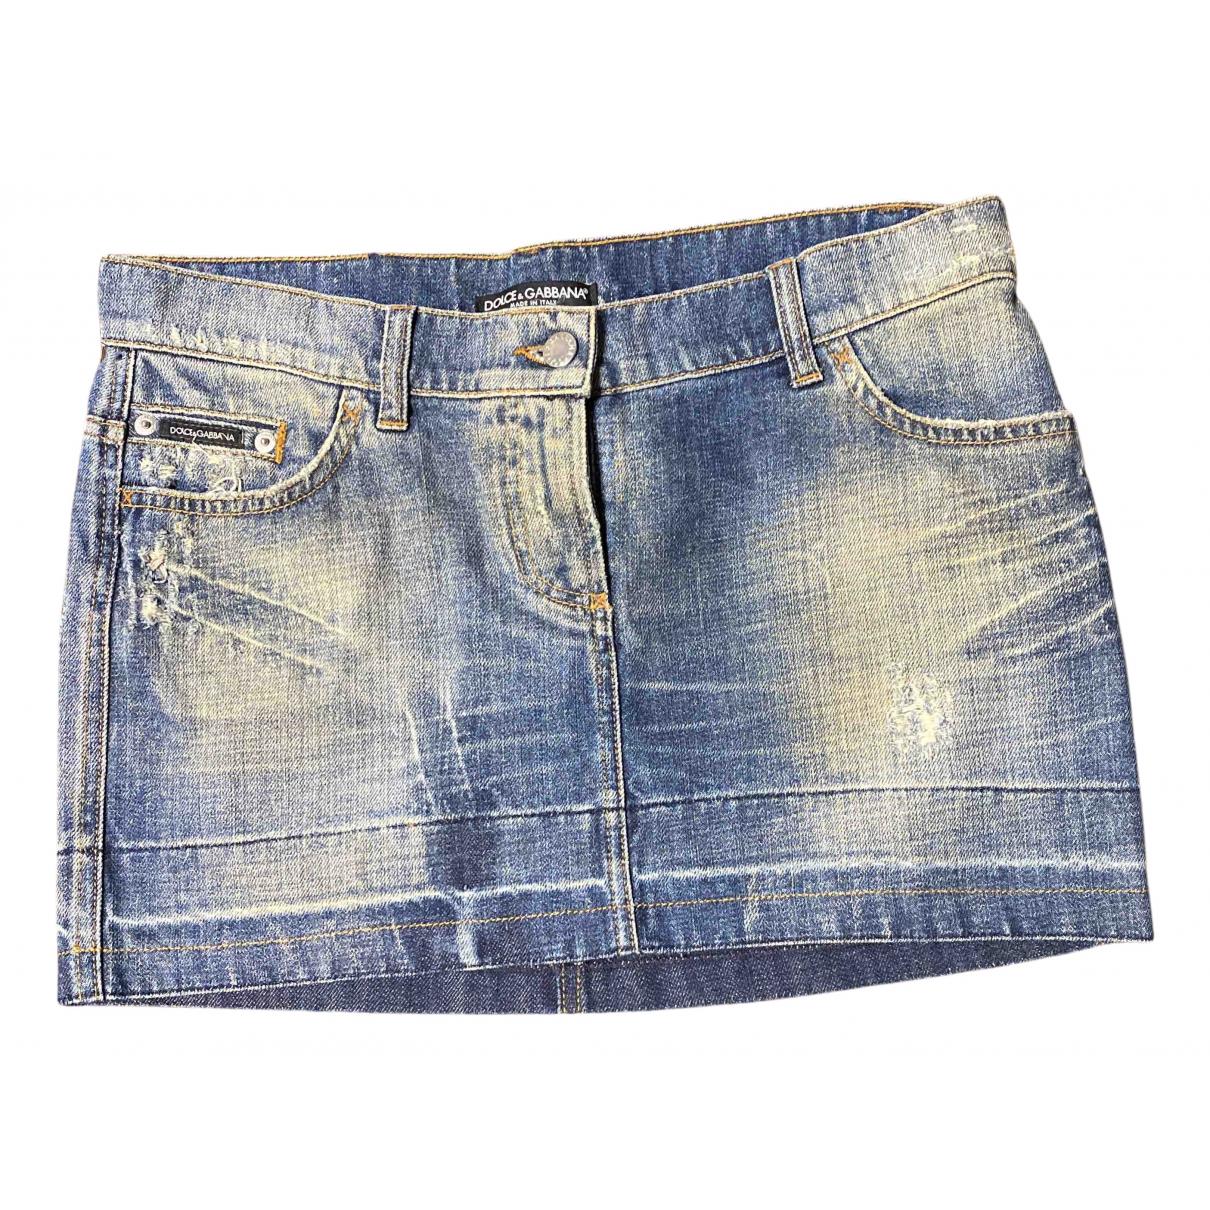 Dolce & Gabbana \N Rocke in  Blau Denim - Jeans